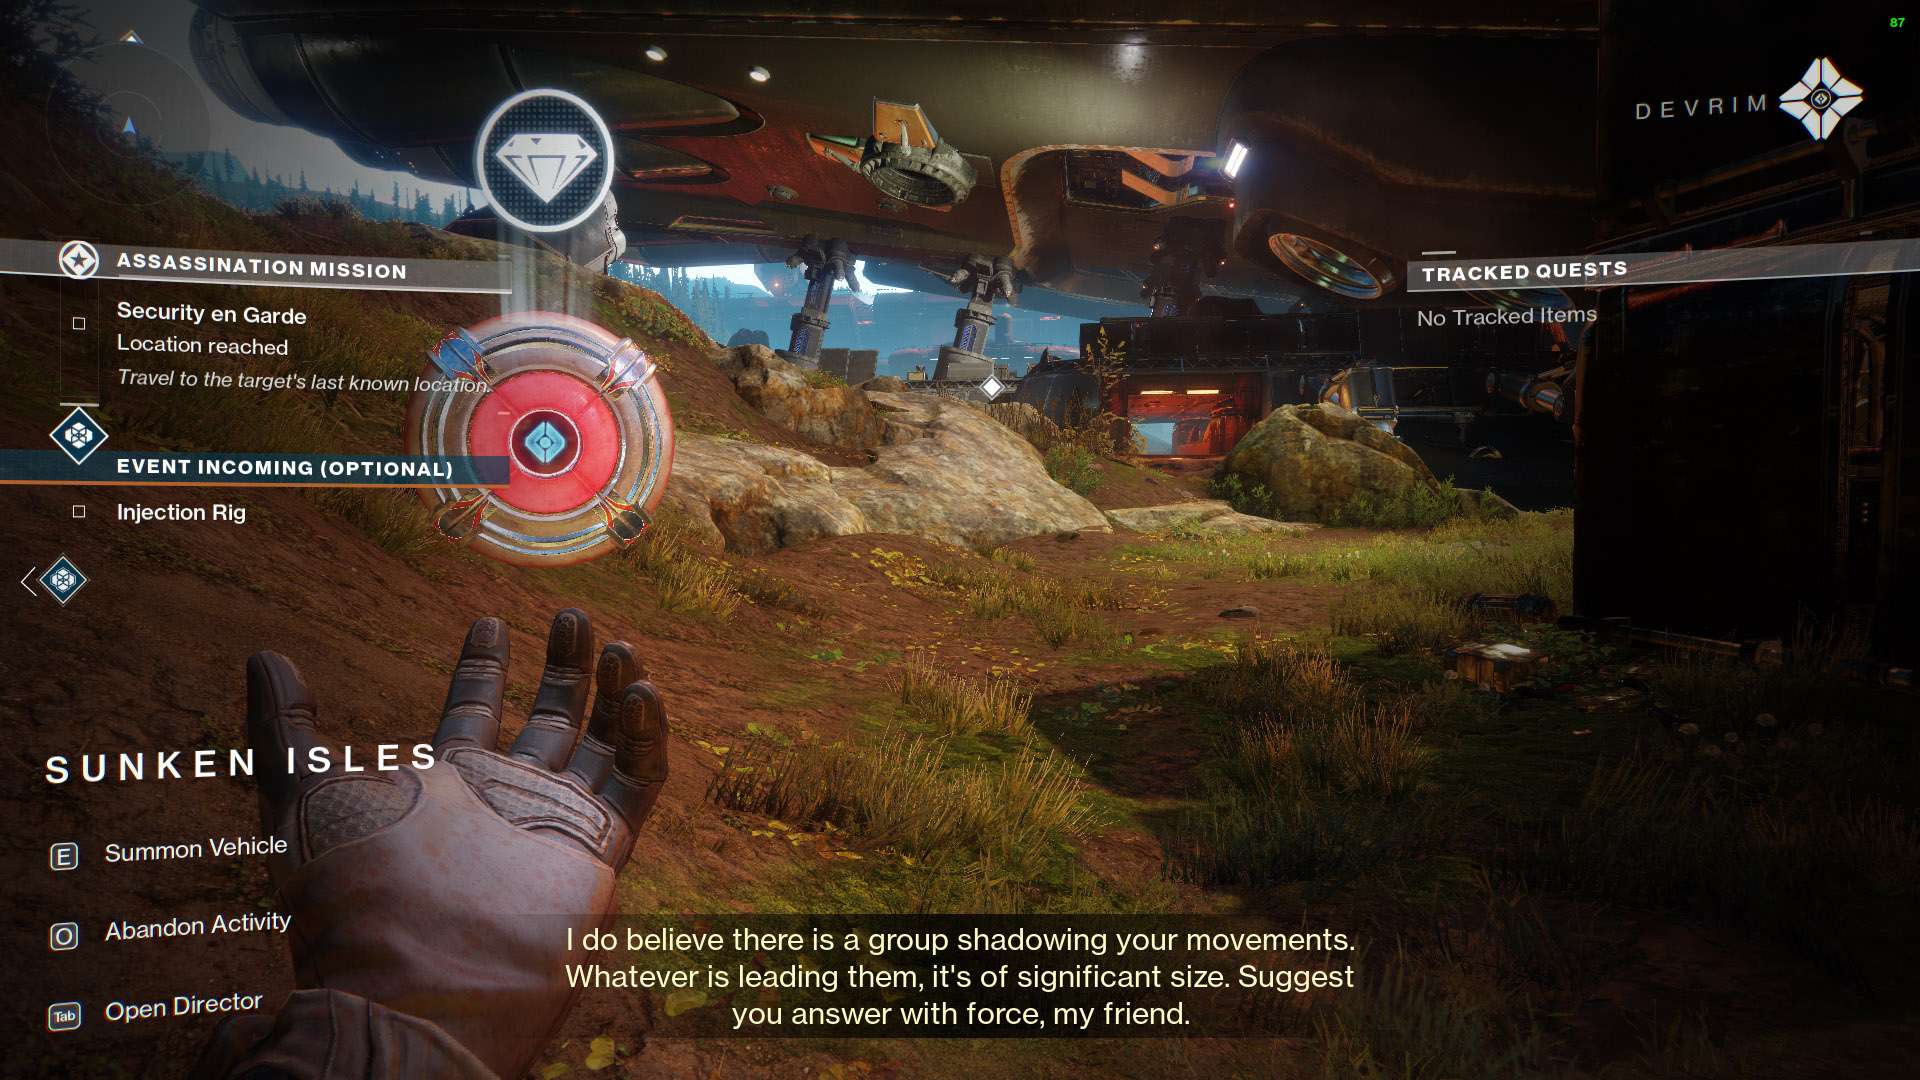 destiny 2 vip patrol objective